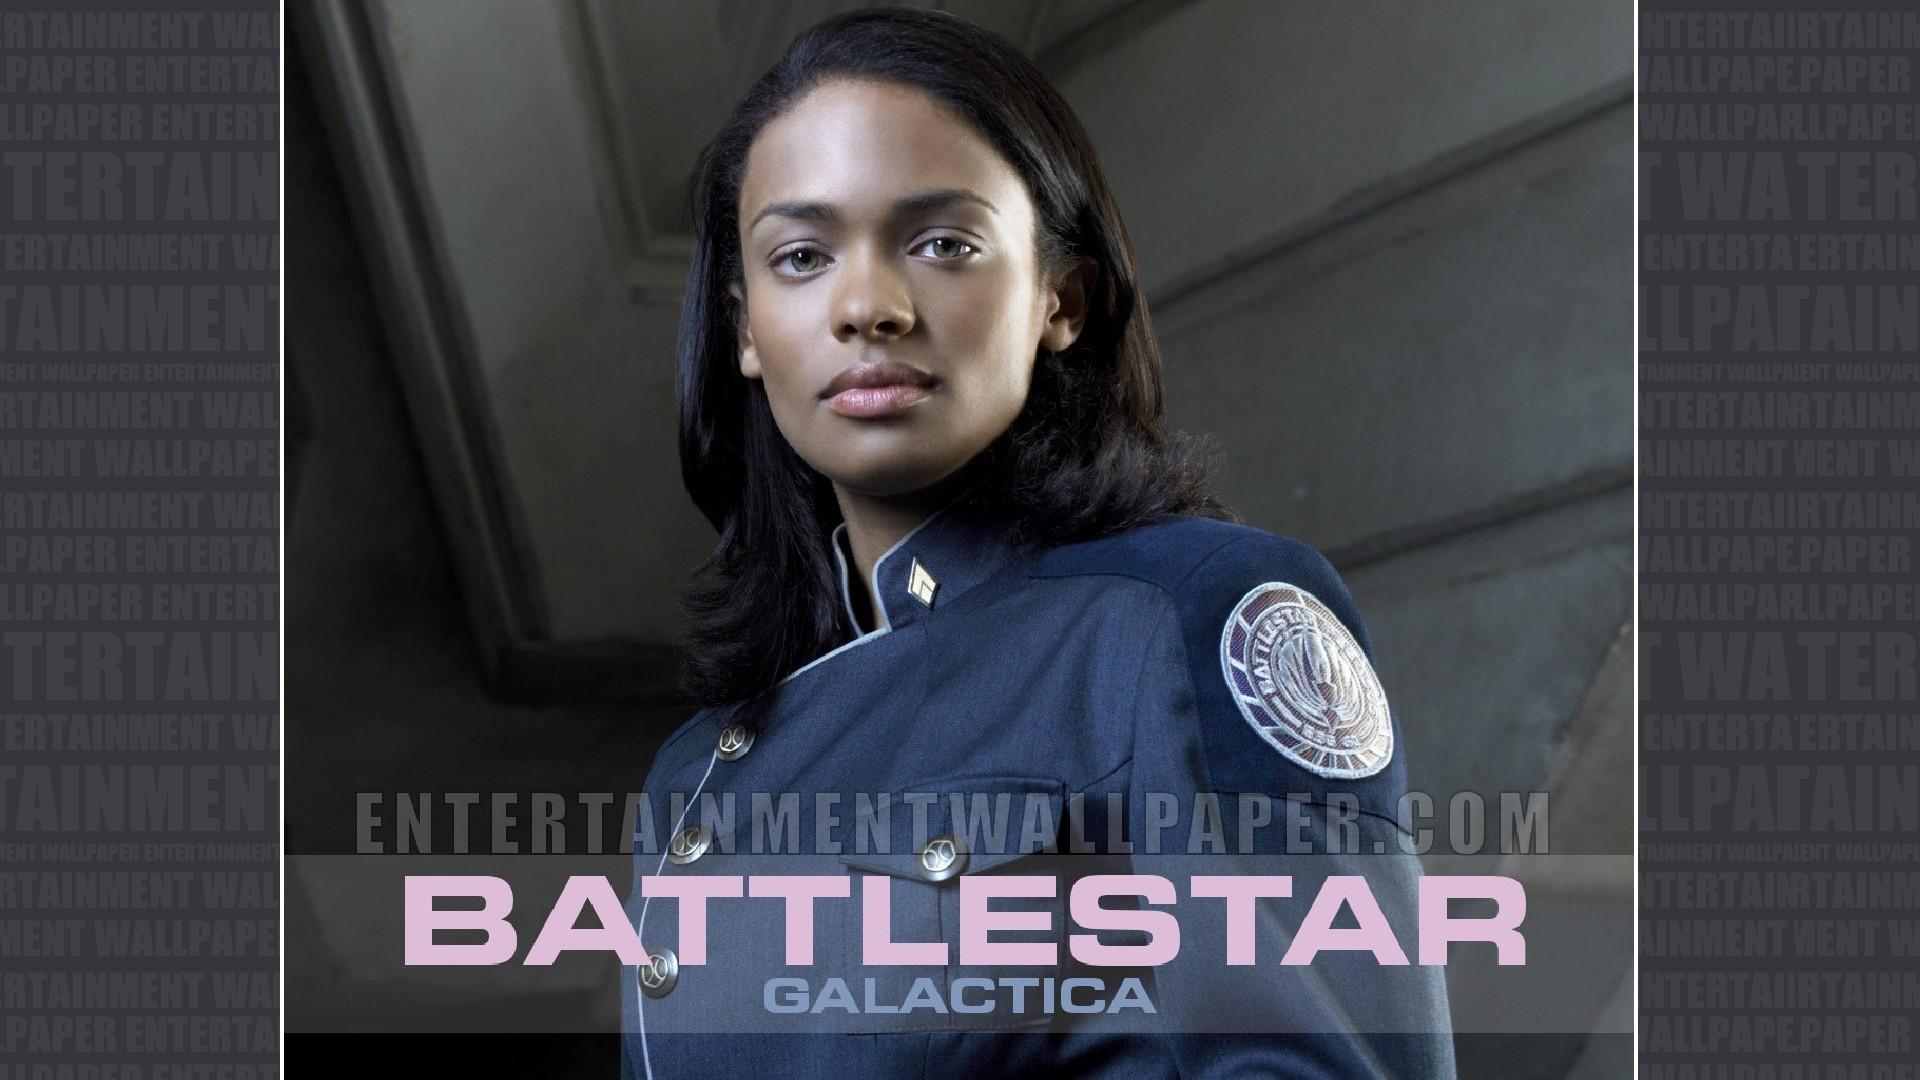 Battlestar Galactica Wallpaper – Original size, download now.